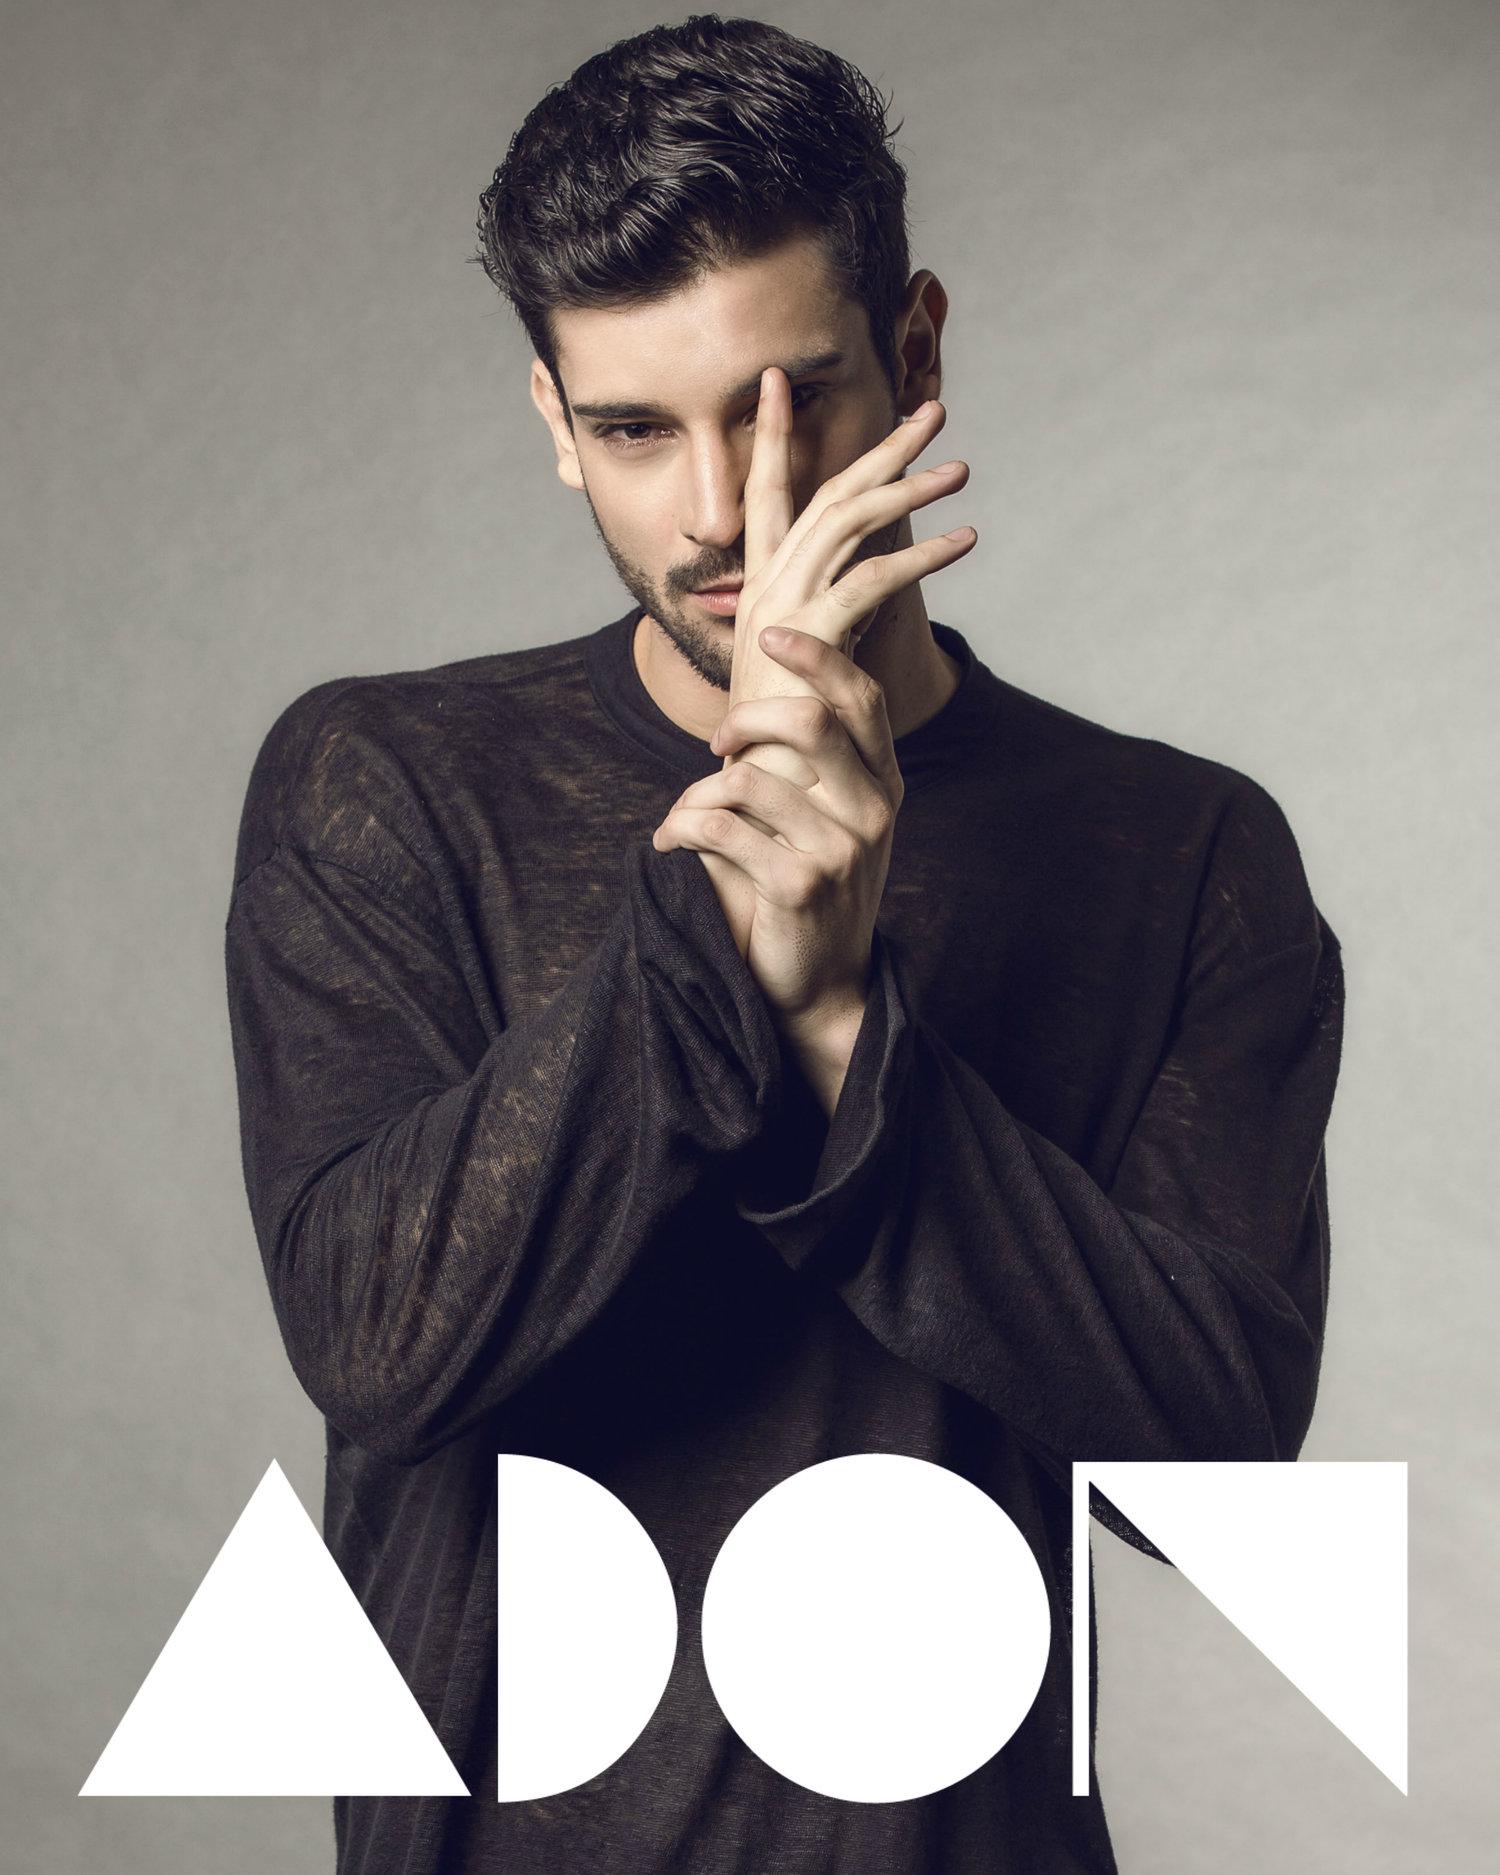 Adon Exclusive: Model Matheus Willian By Jason Oung